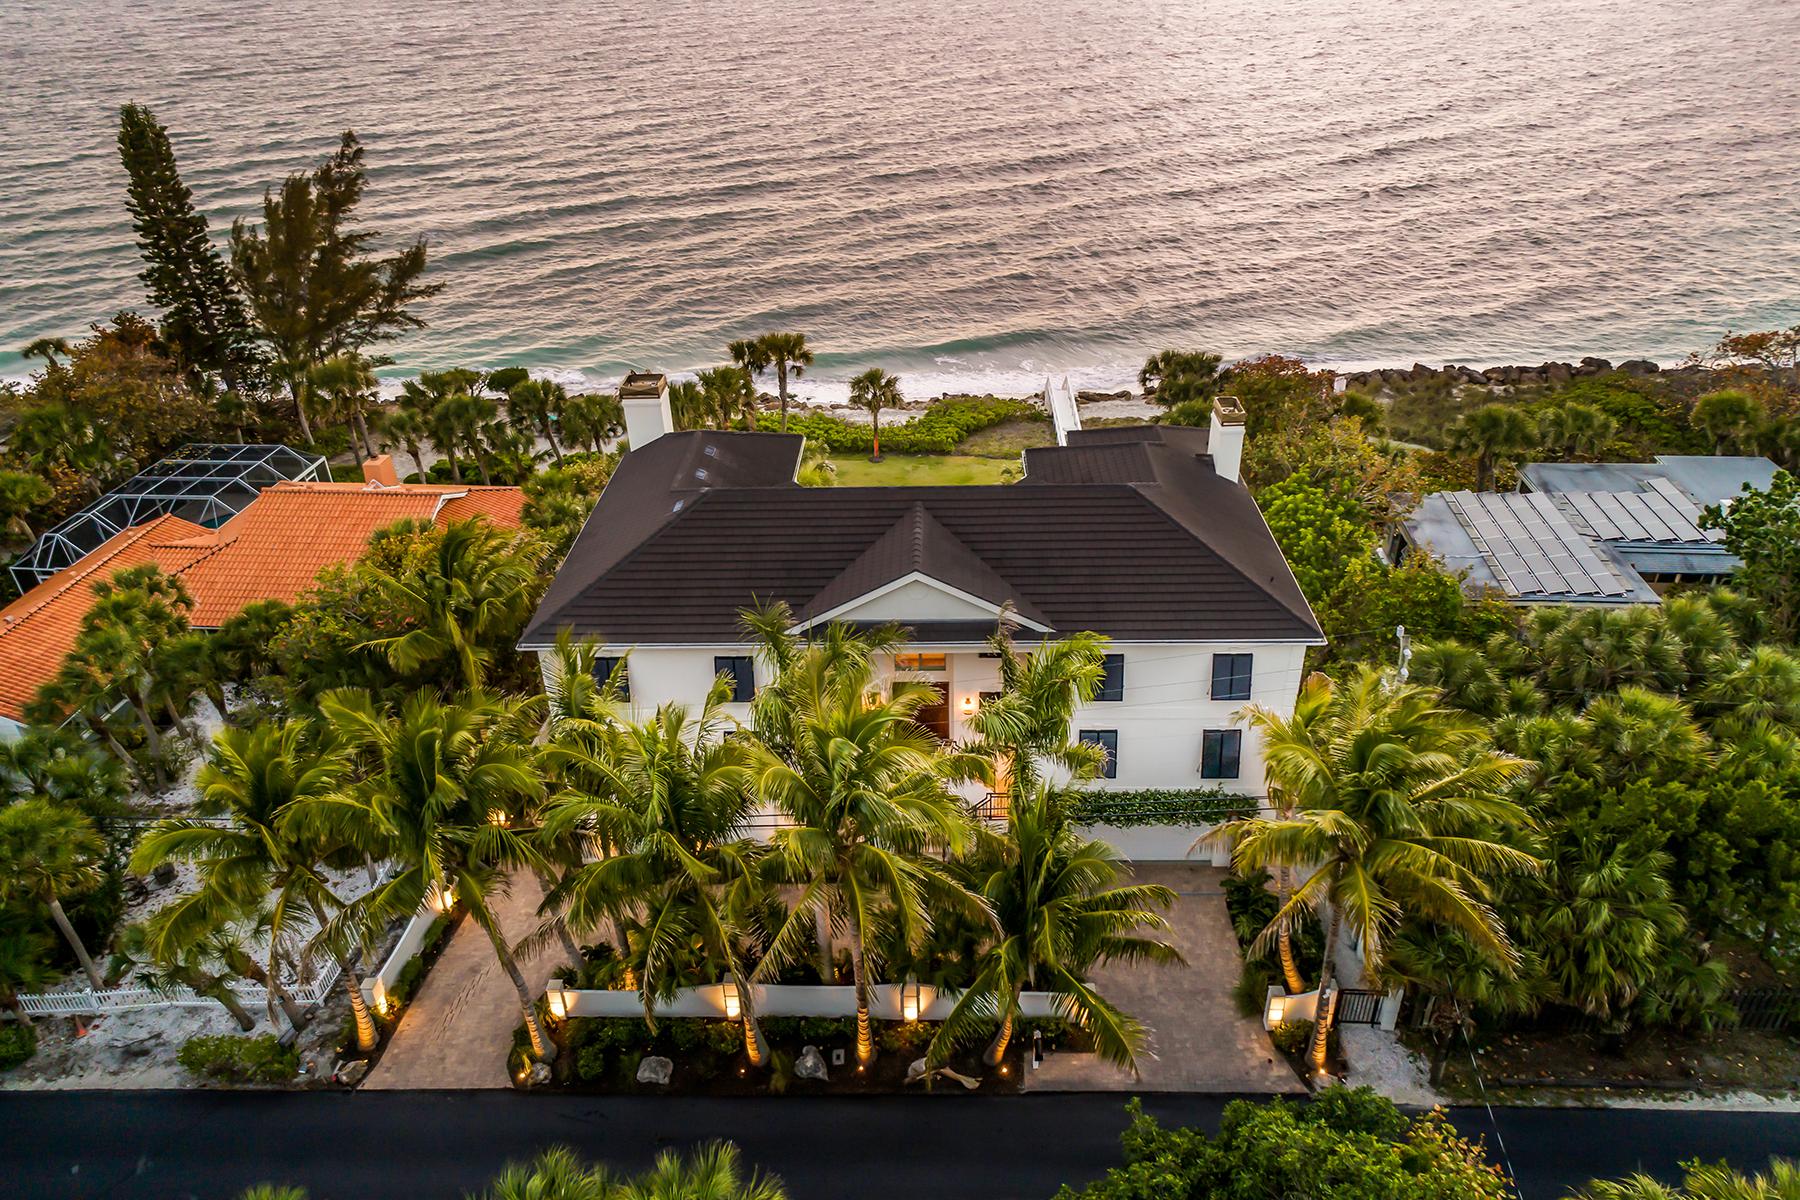 Single Family Homes for Active at 4009 Casey Key Rd Nokomis, Florida 34275 United States